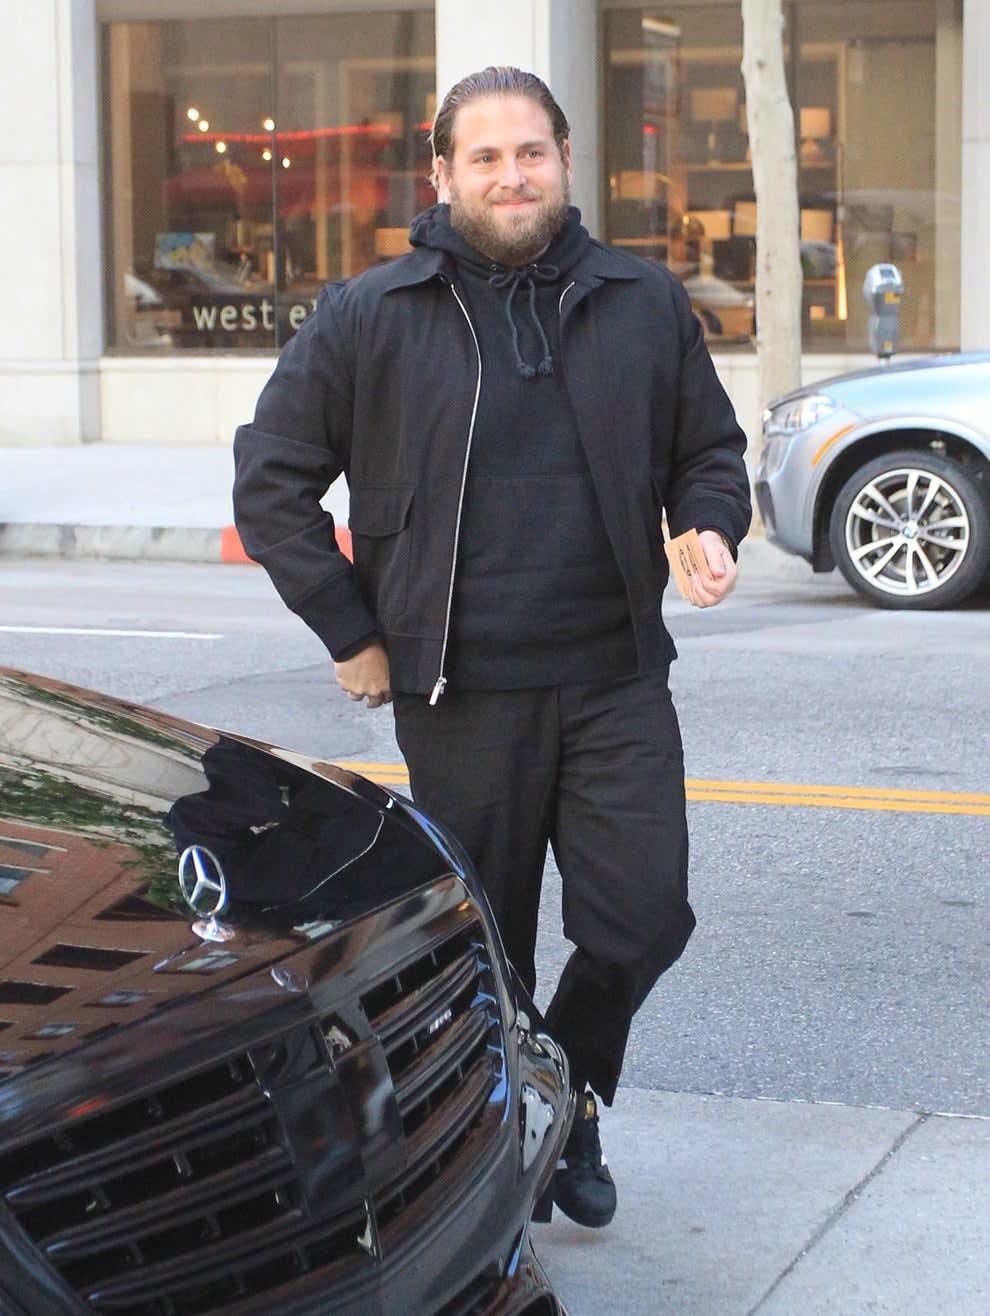 Jonah smiles as he walks by a car